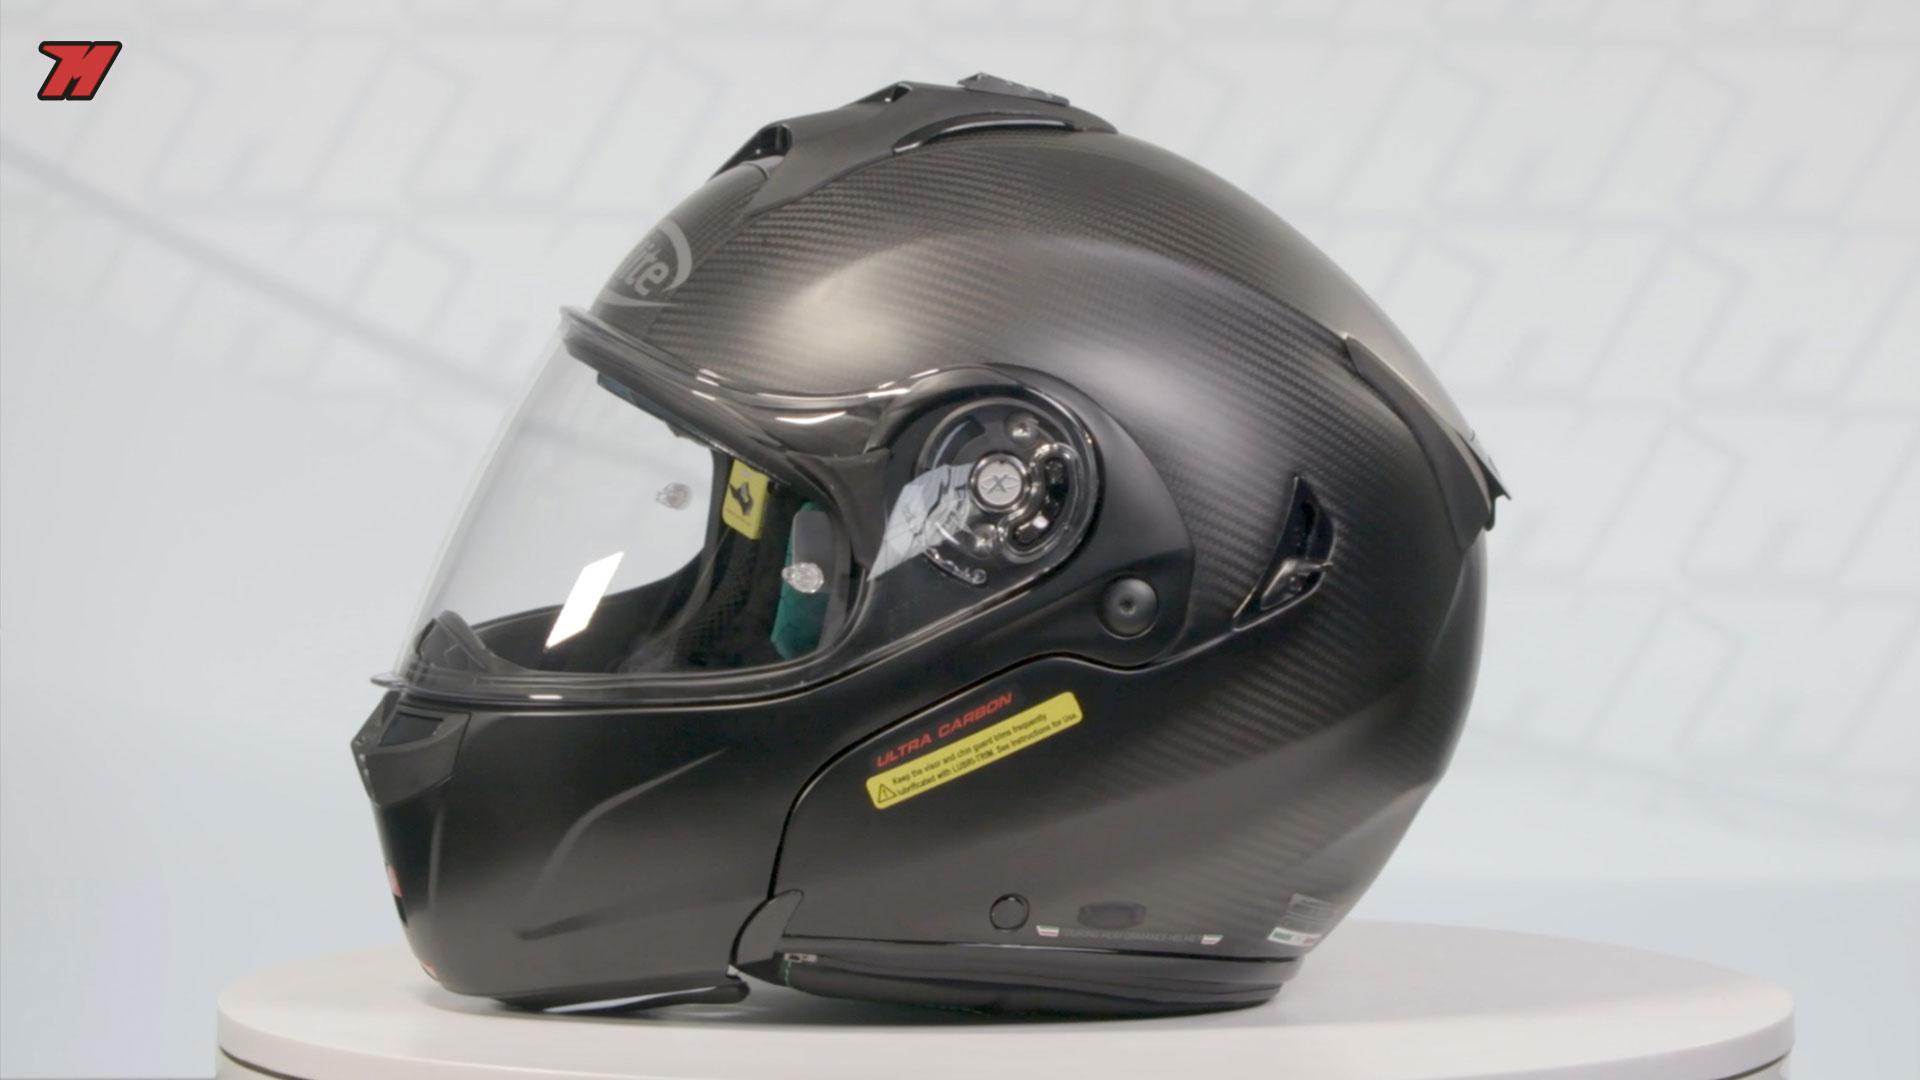 Carbon Fiber Motorcycle Helmets >> The 8 Lightest Motorcycle Helmets Of The World Motocard